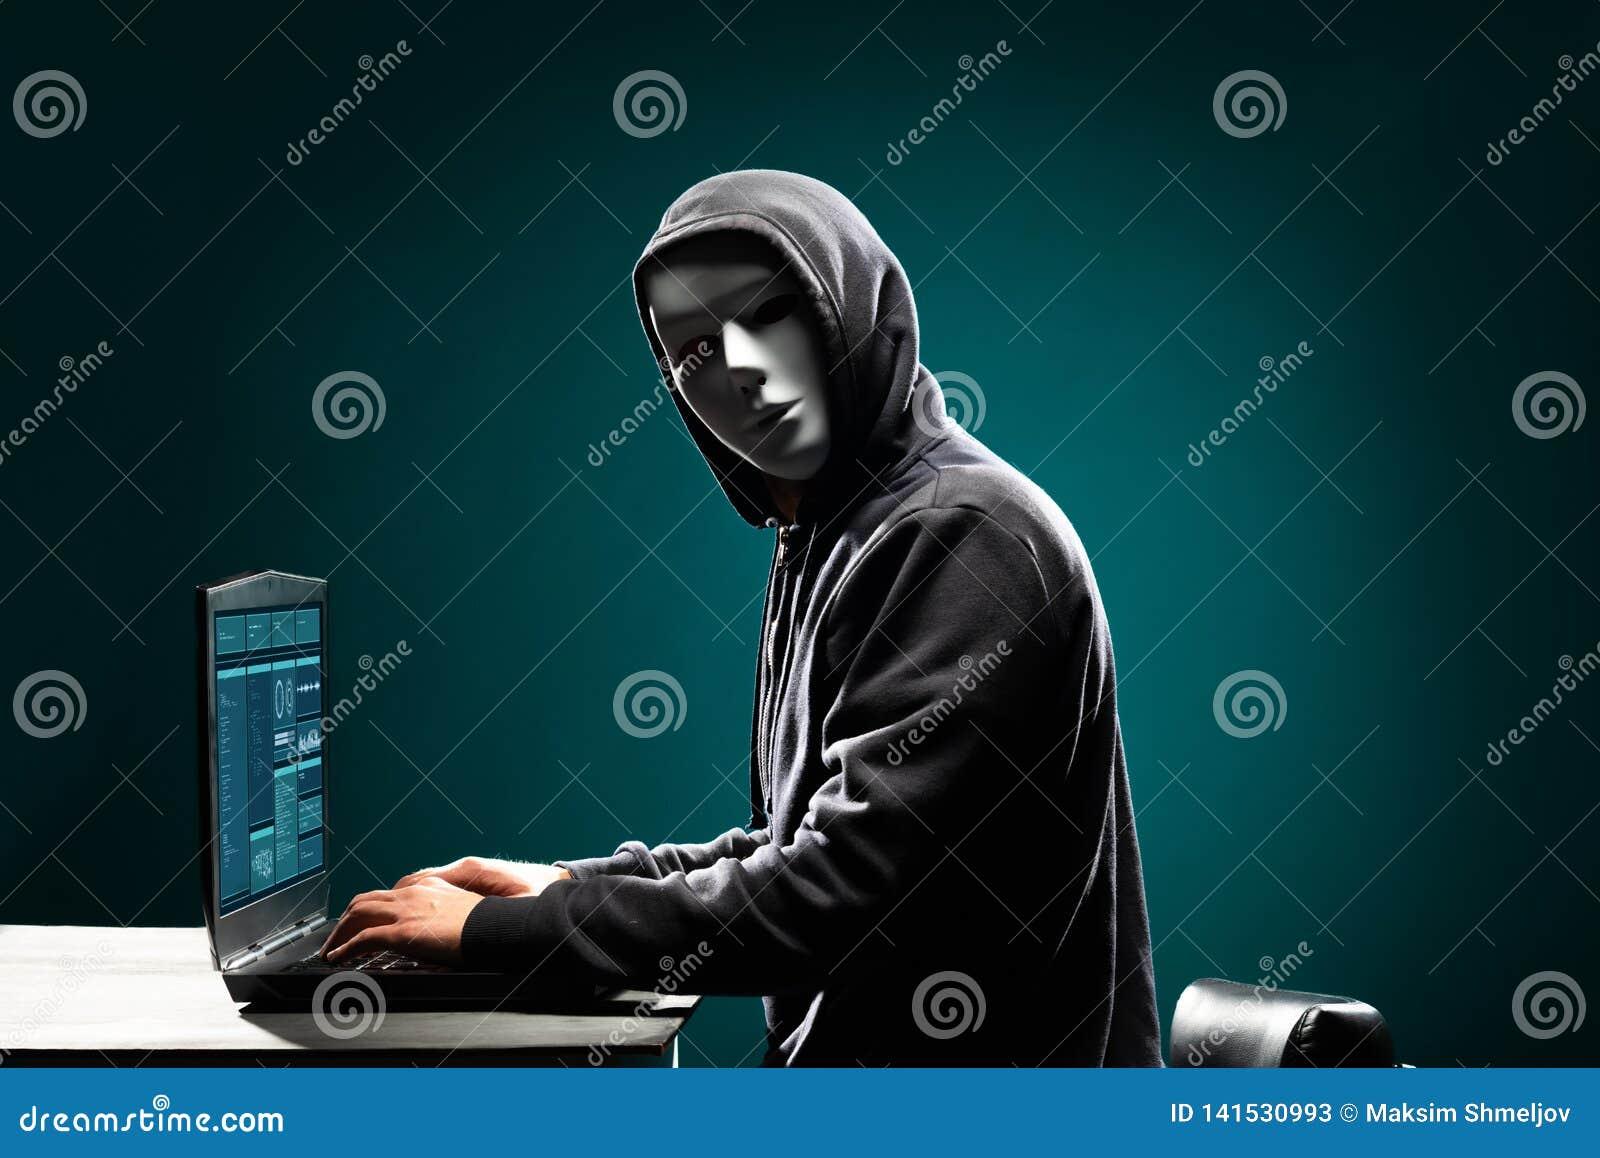 Computerhakker in wit masker en hoodie Verduisterd donker gezicht Gegevensdief, Internet-fraude, darknet en cyber veiligheid